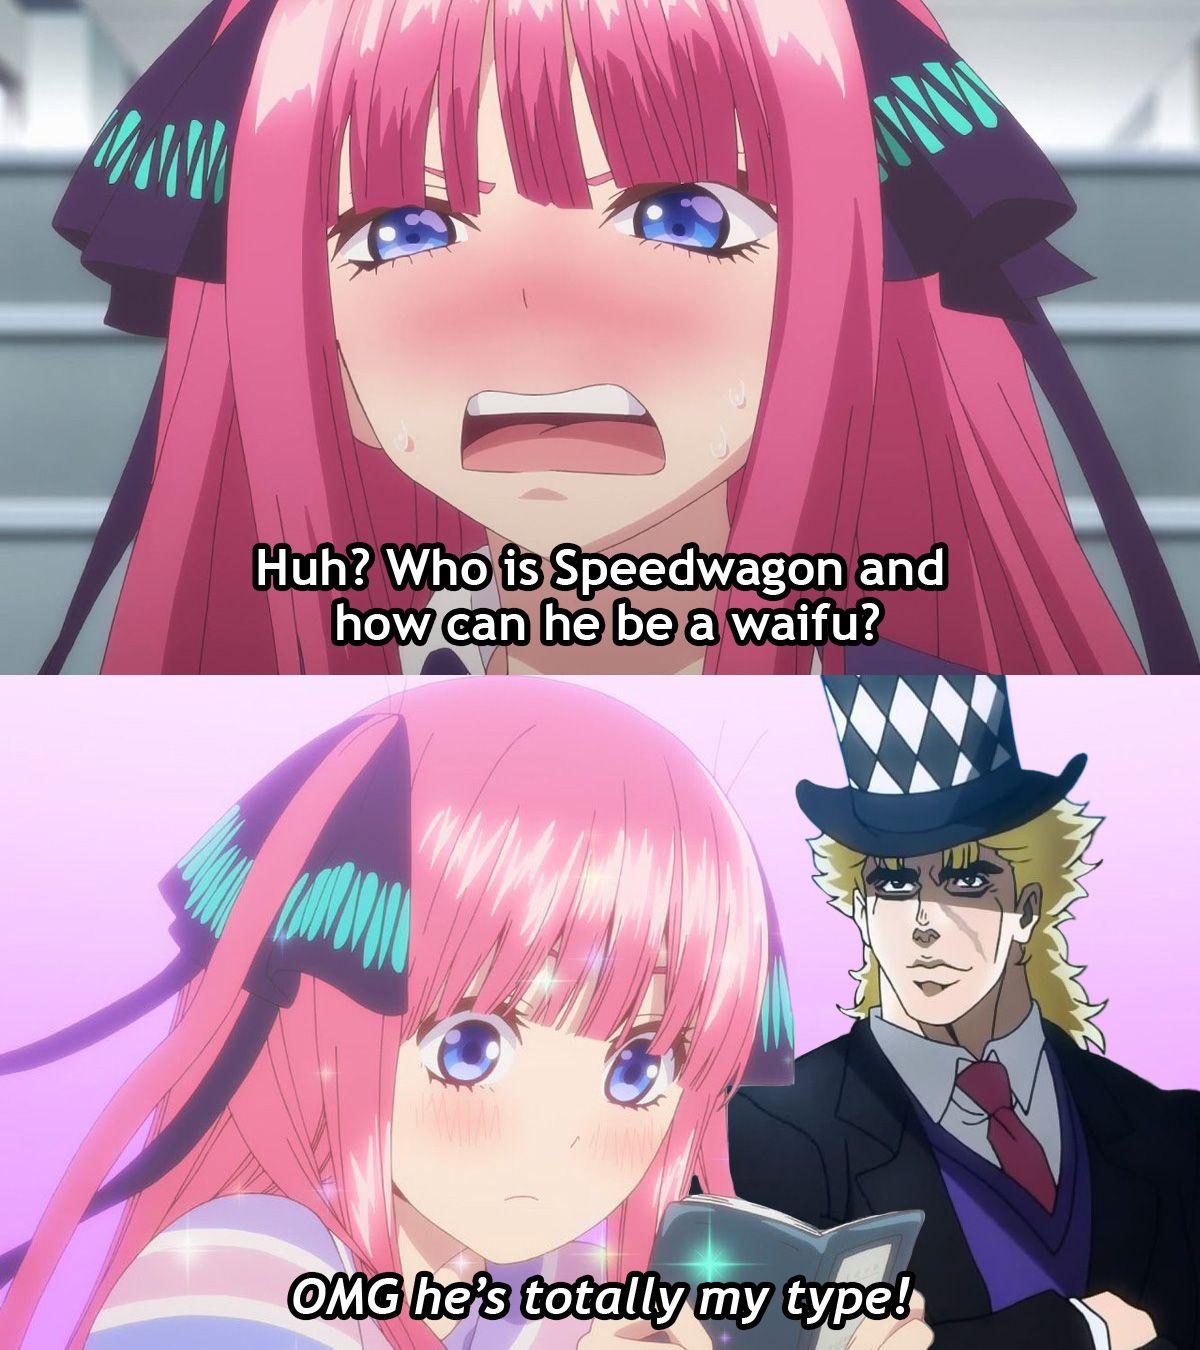 Daily Speedwagon Meme #1 / 7 : Nino loves a badass blonde